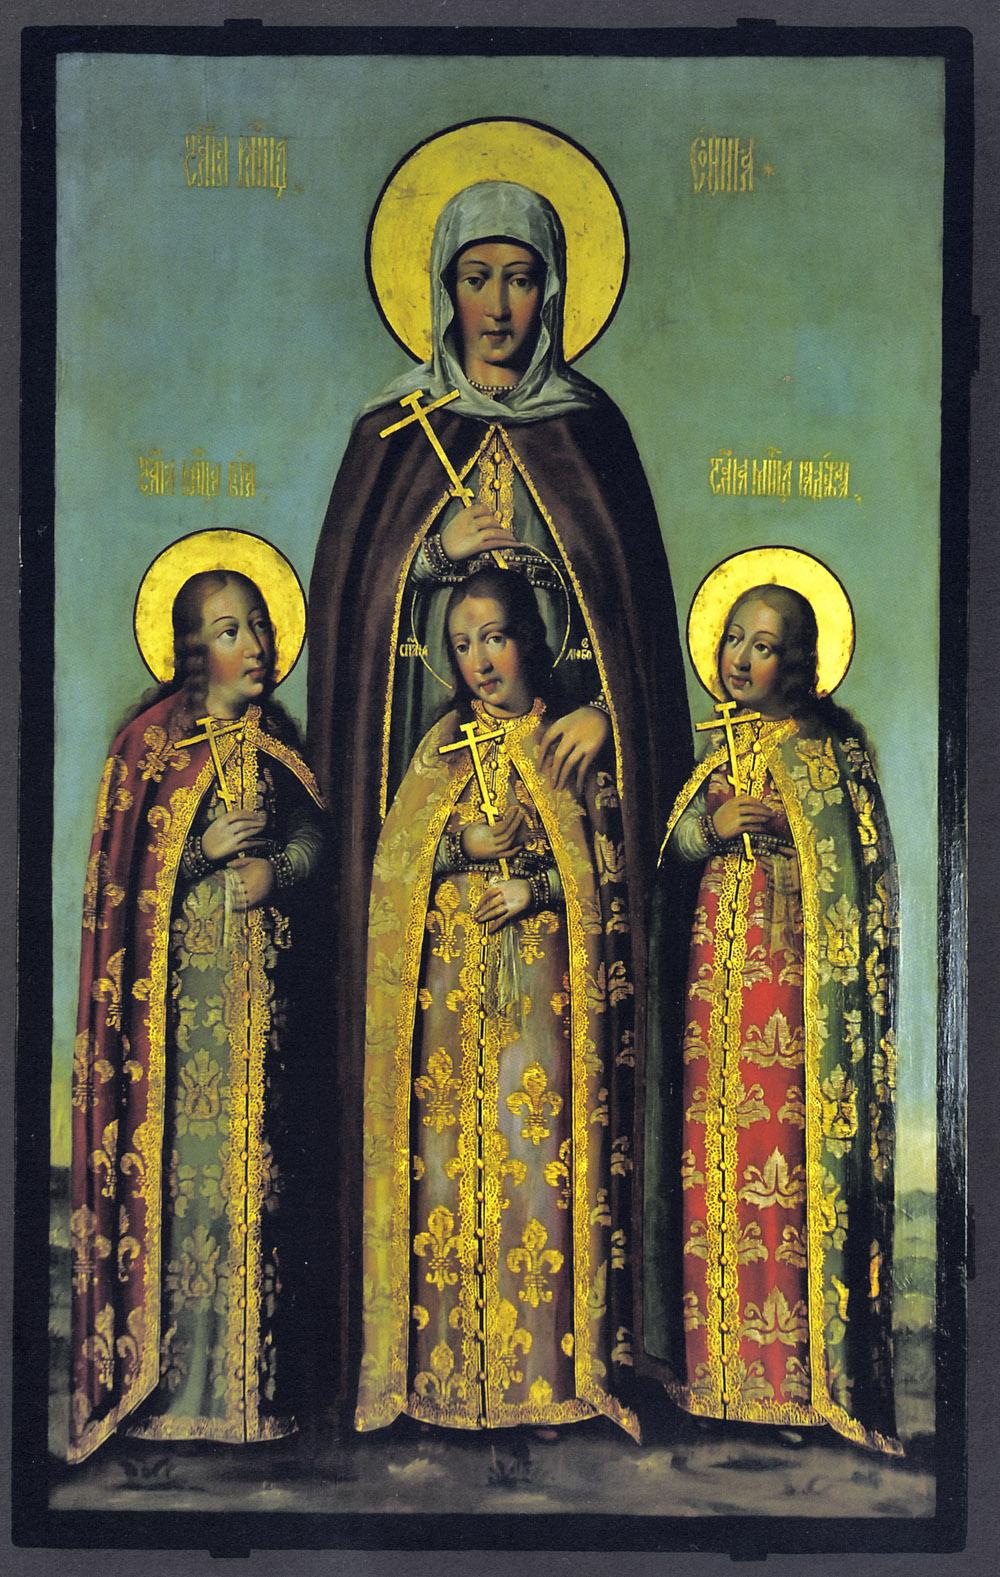 http://en.academic.ru/pictures/enwiki/75/Karp_Zolotaryov_Sophia_Faith_Hope_Charity_1685.jpg